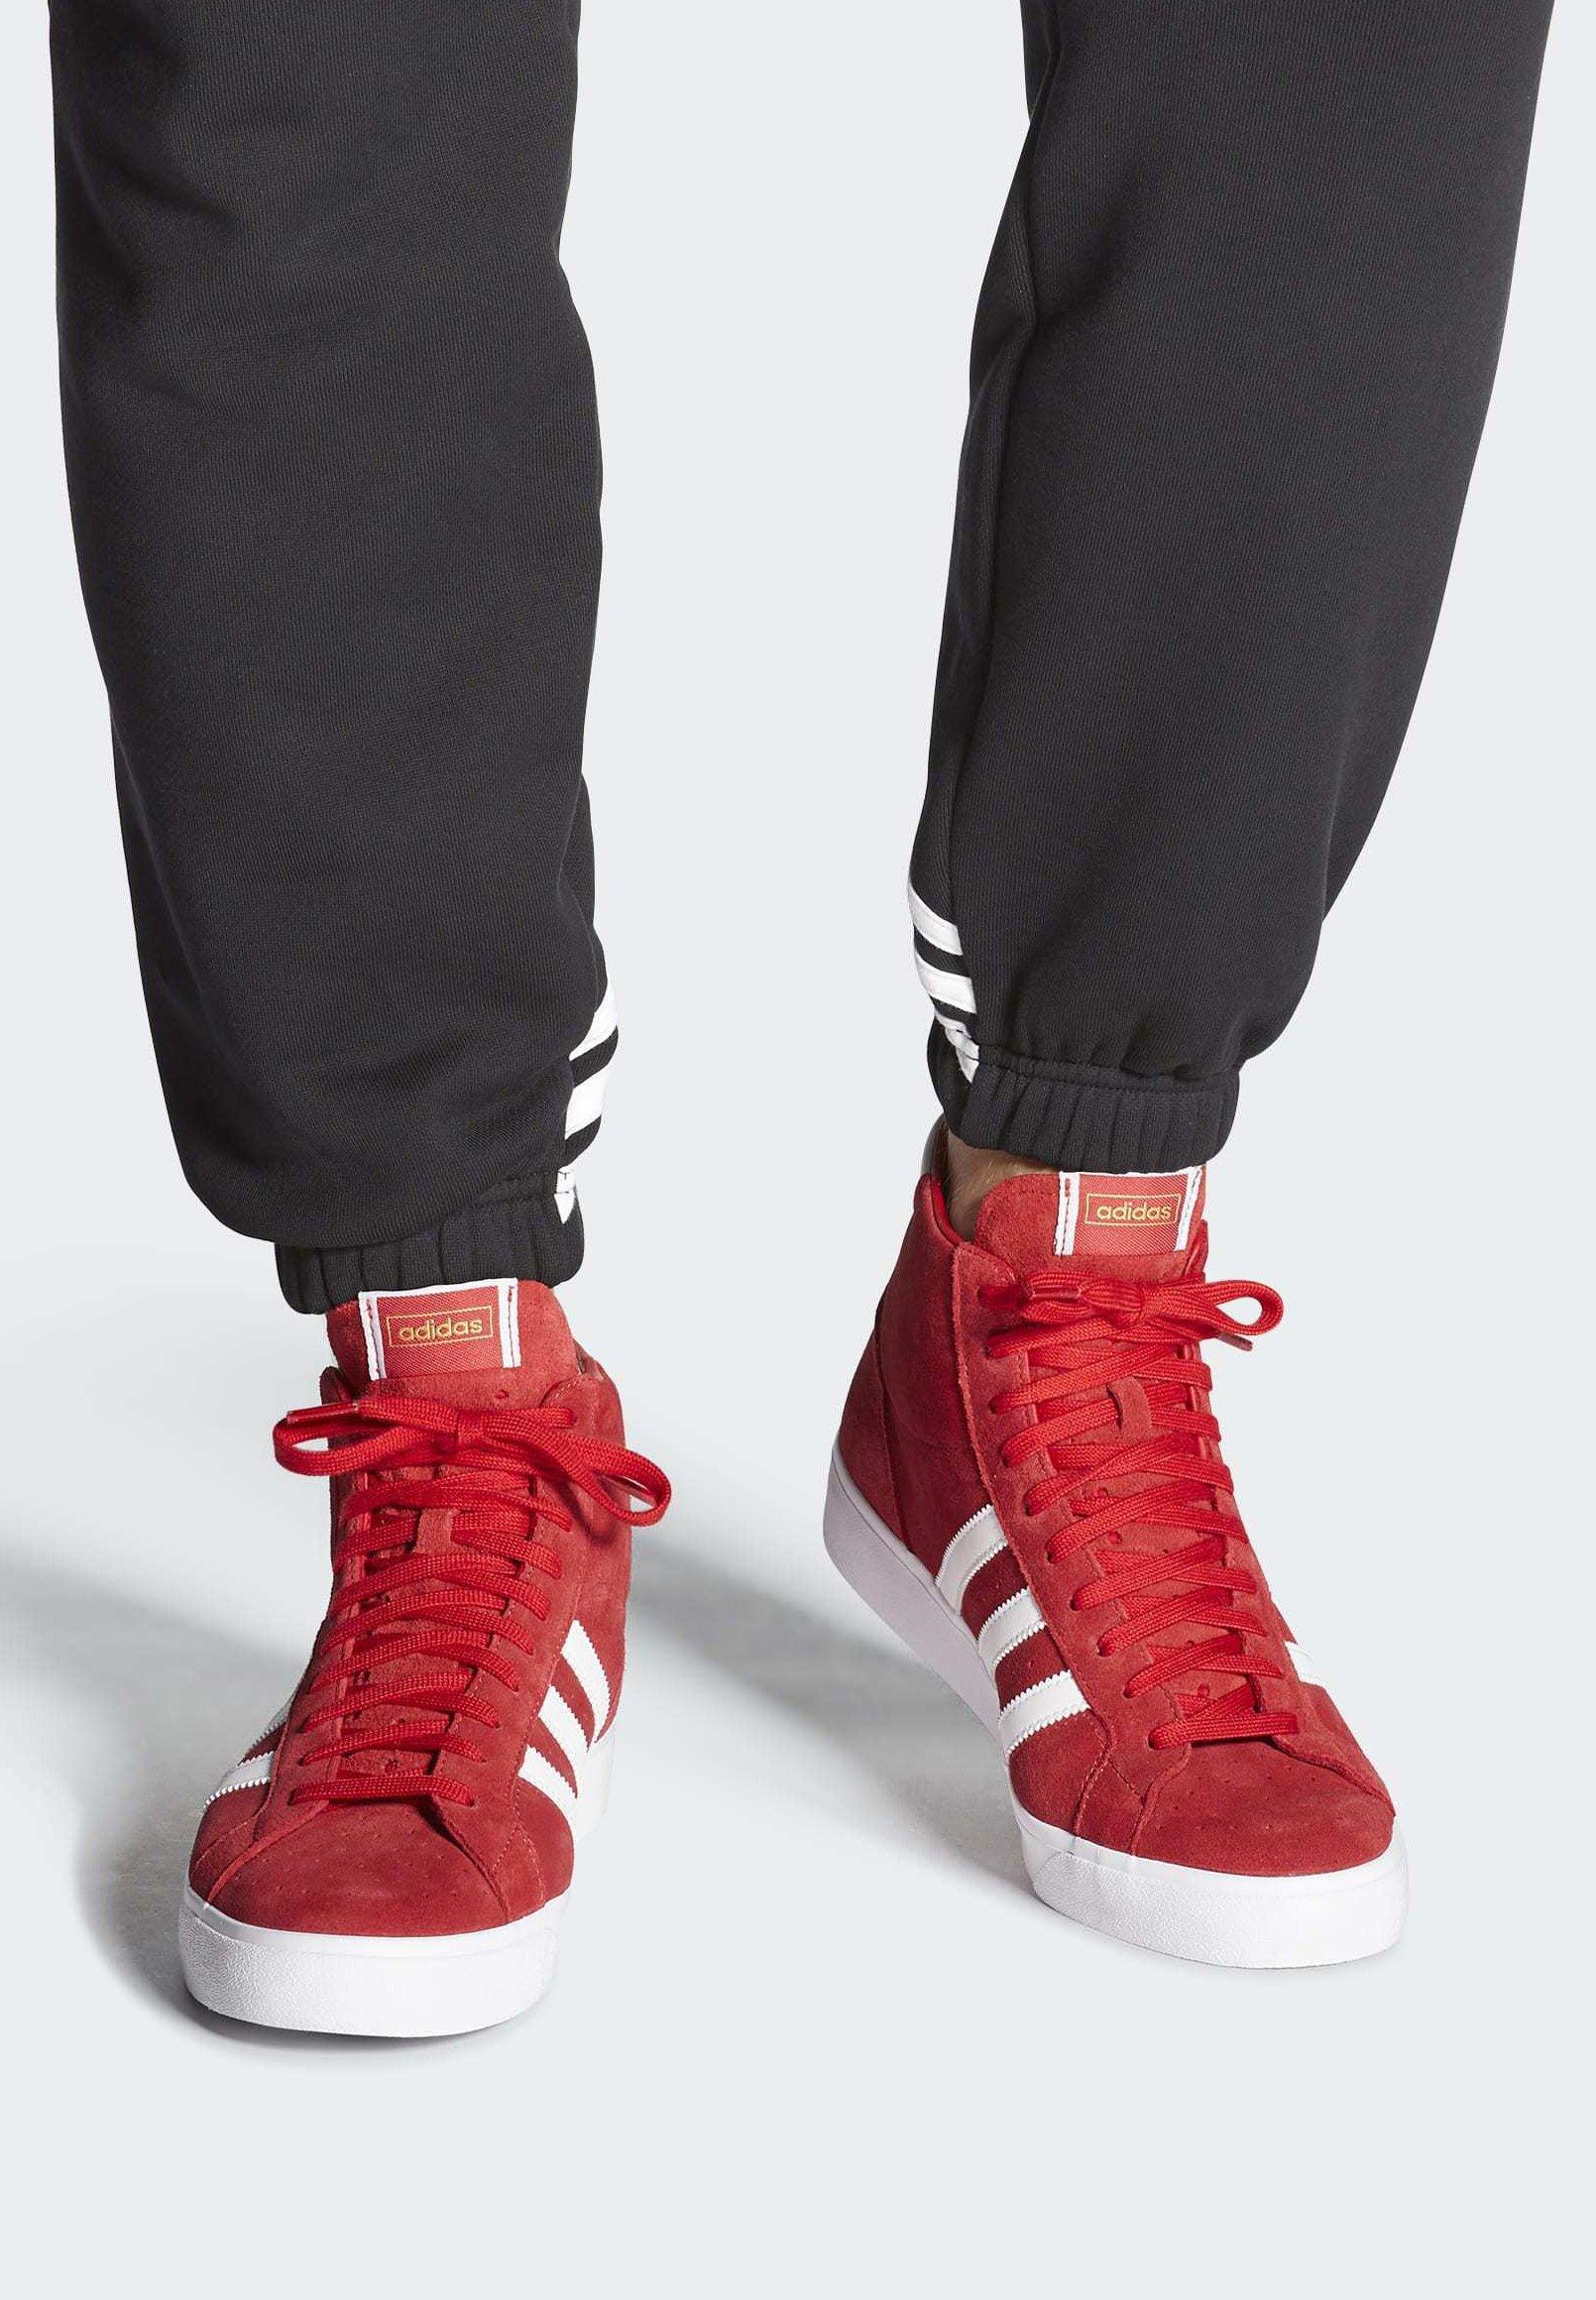 Adidas Originals Basket Profi Shoes - Sneakers Alte Red tPQPZPS